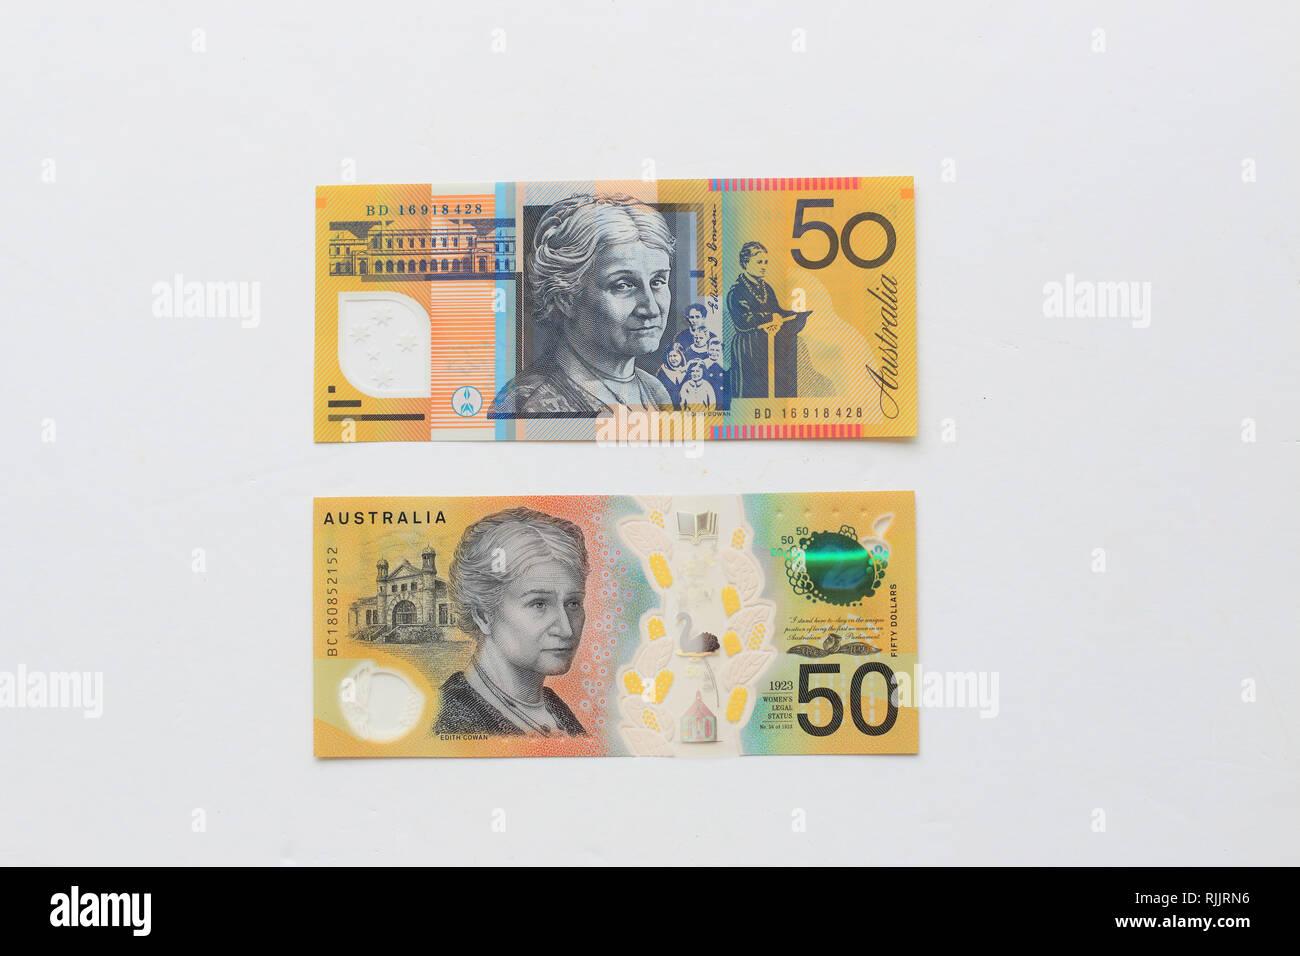 15 Australian Dollars Total Australia 5 10 Banknotes 2 Bank Note Good Cond.